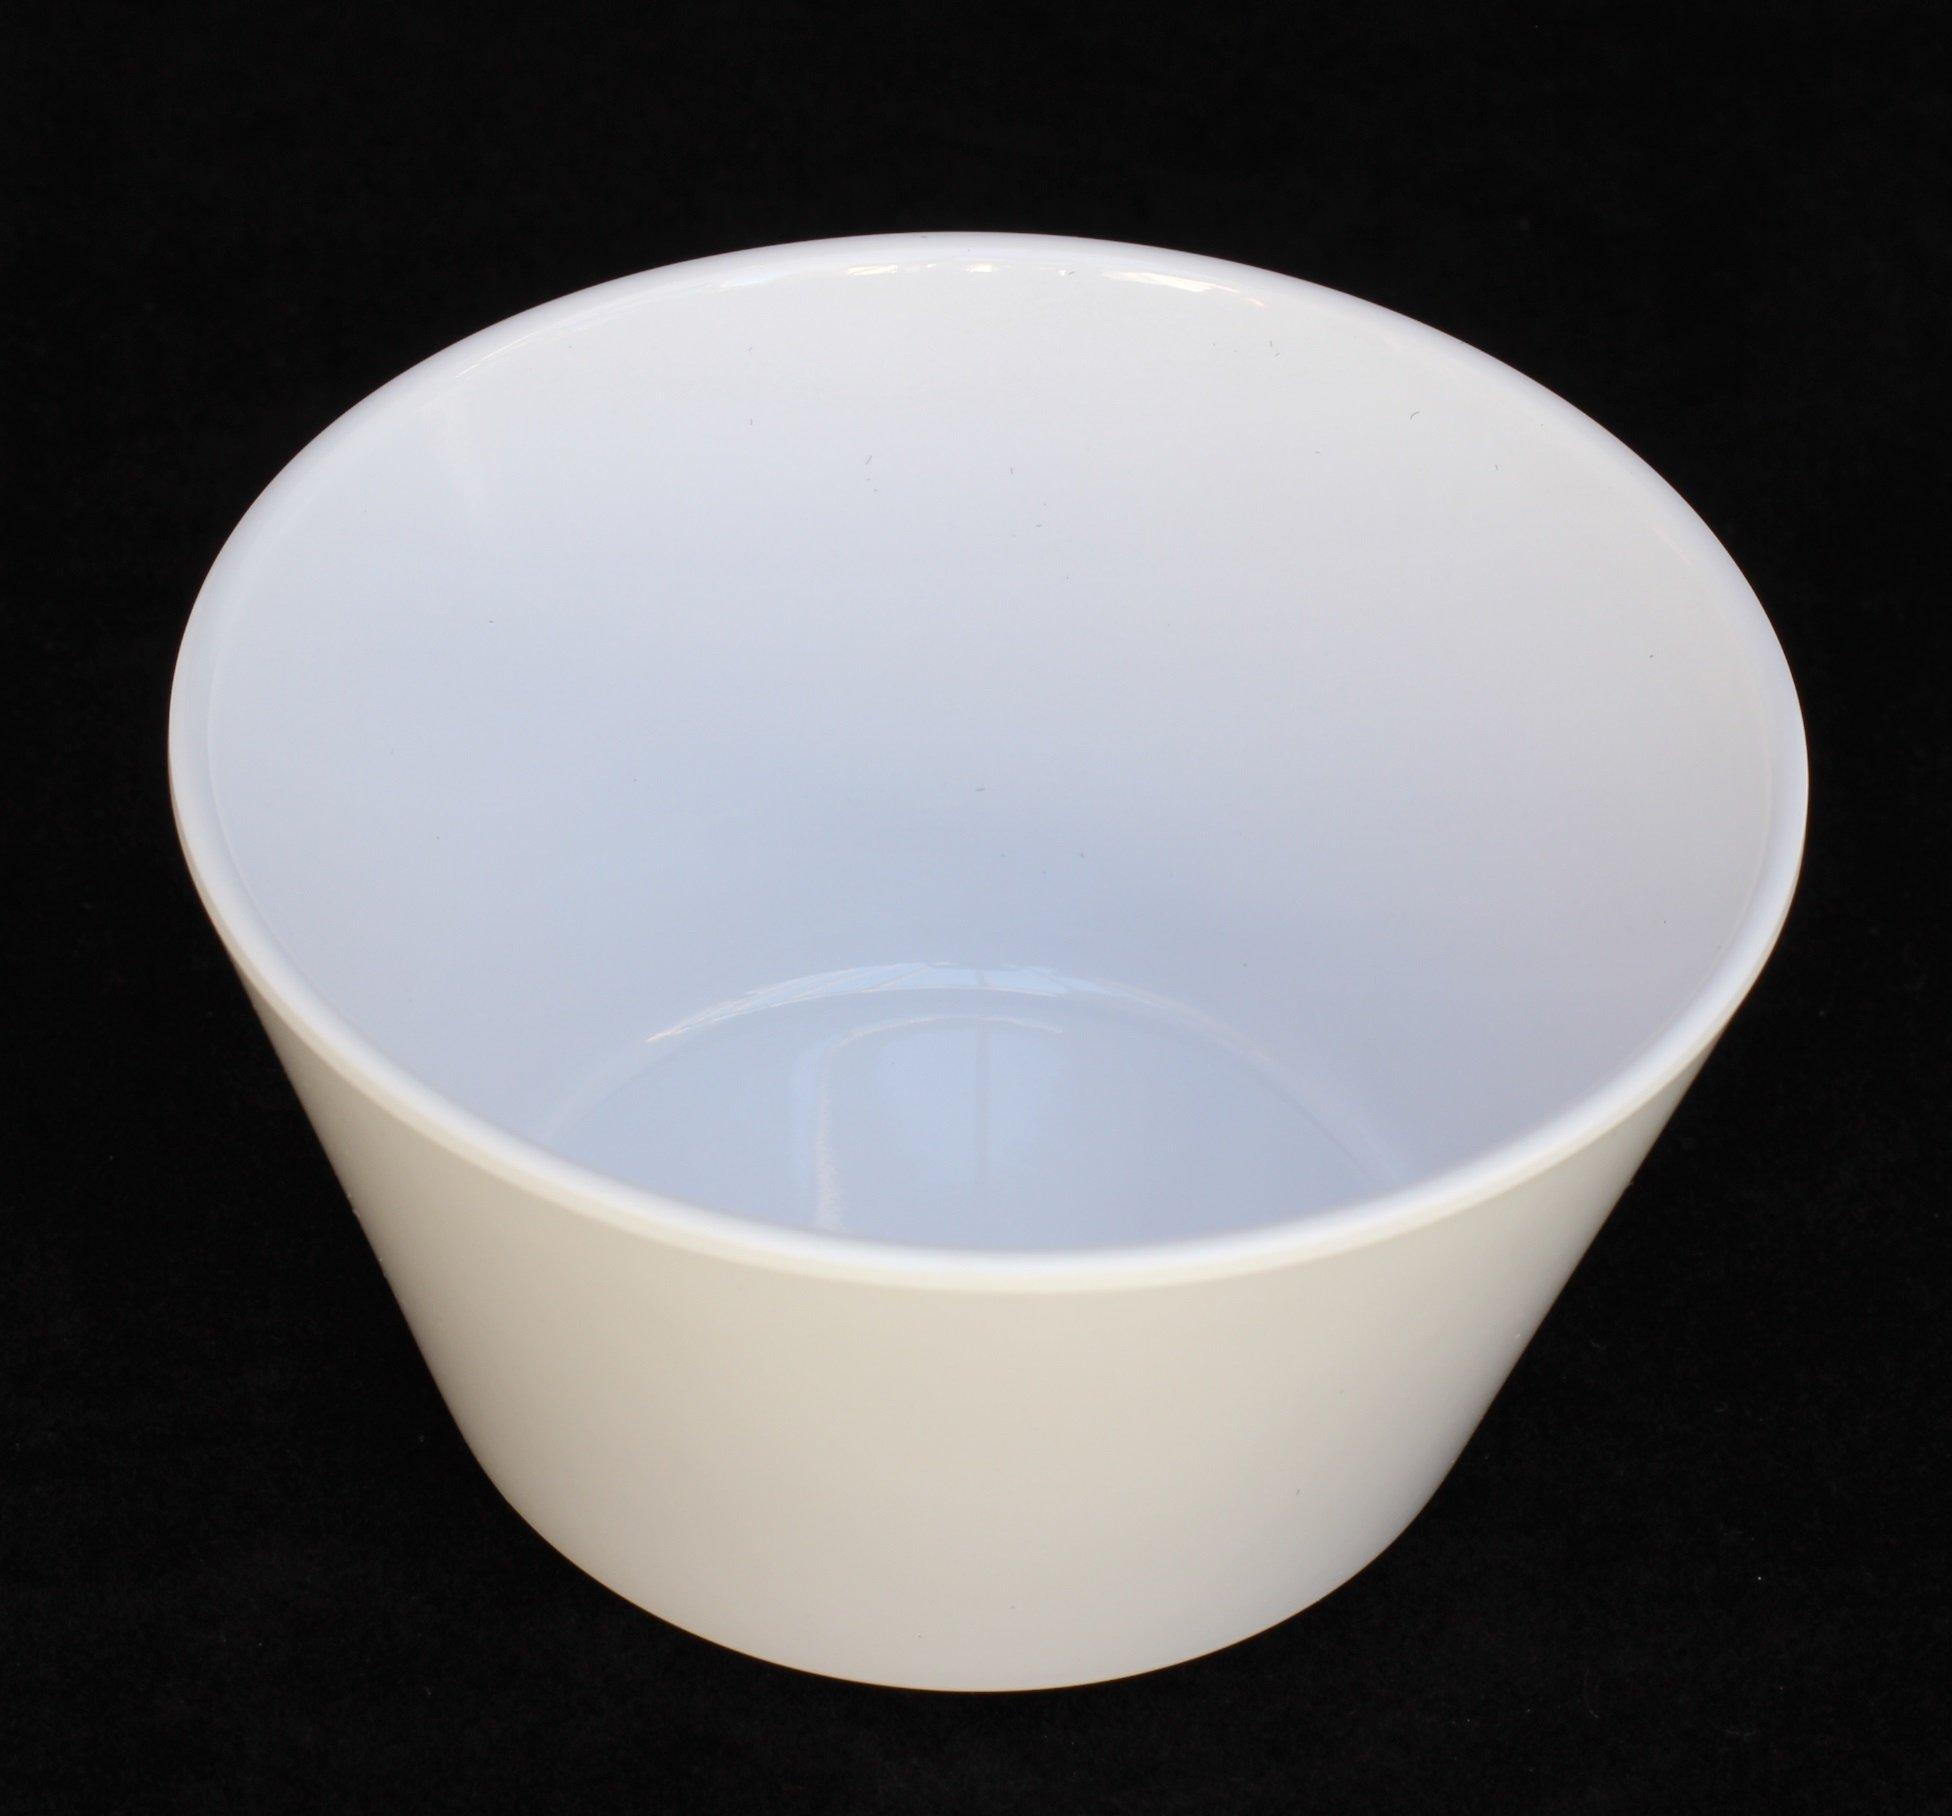 Z-Moments Western Melamine 302 8-ounce Bouillon Cup Bowl, 3 7/8 inch -- 144 per case (12 dozen) NSF (White)